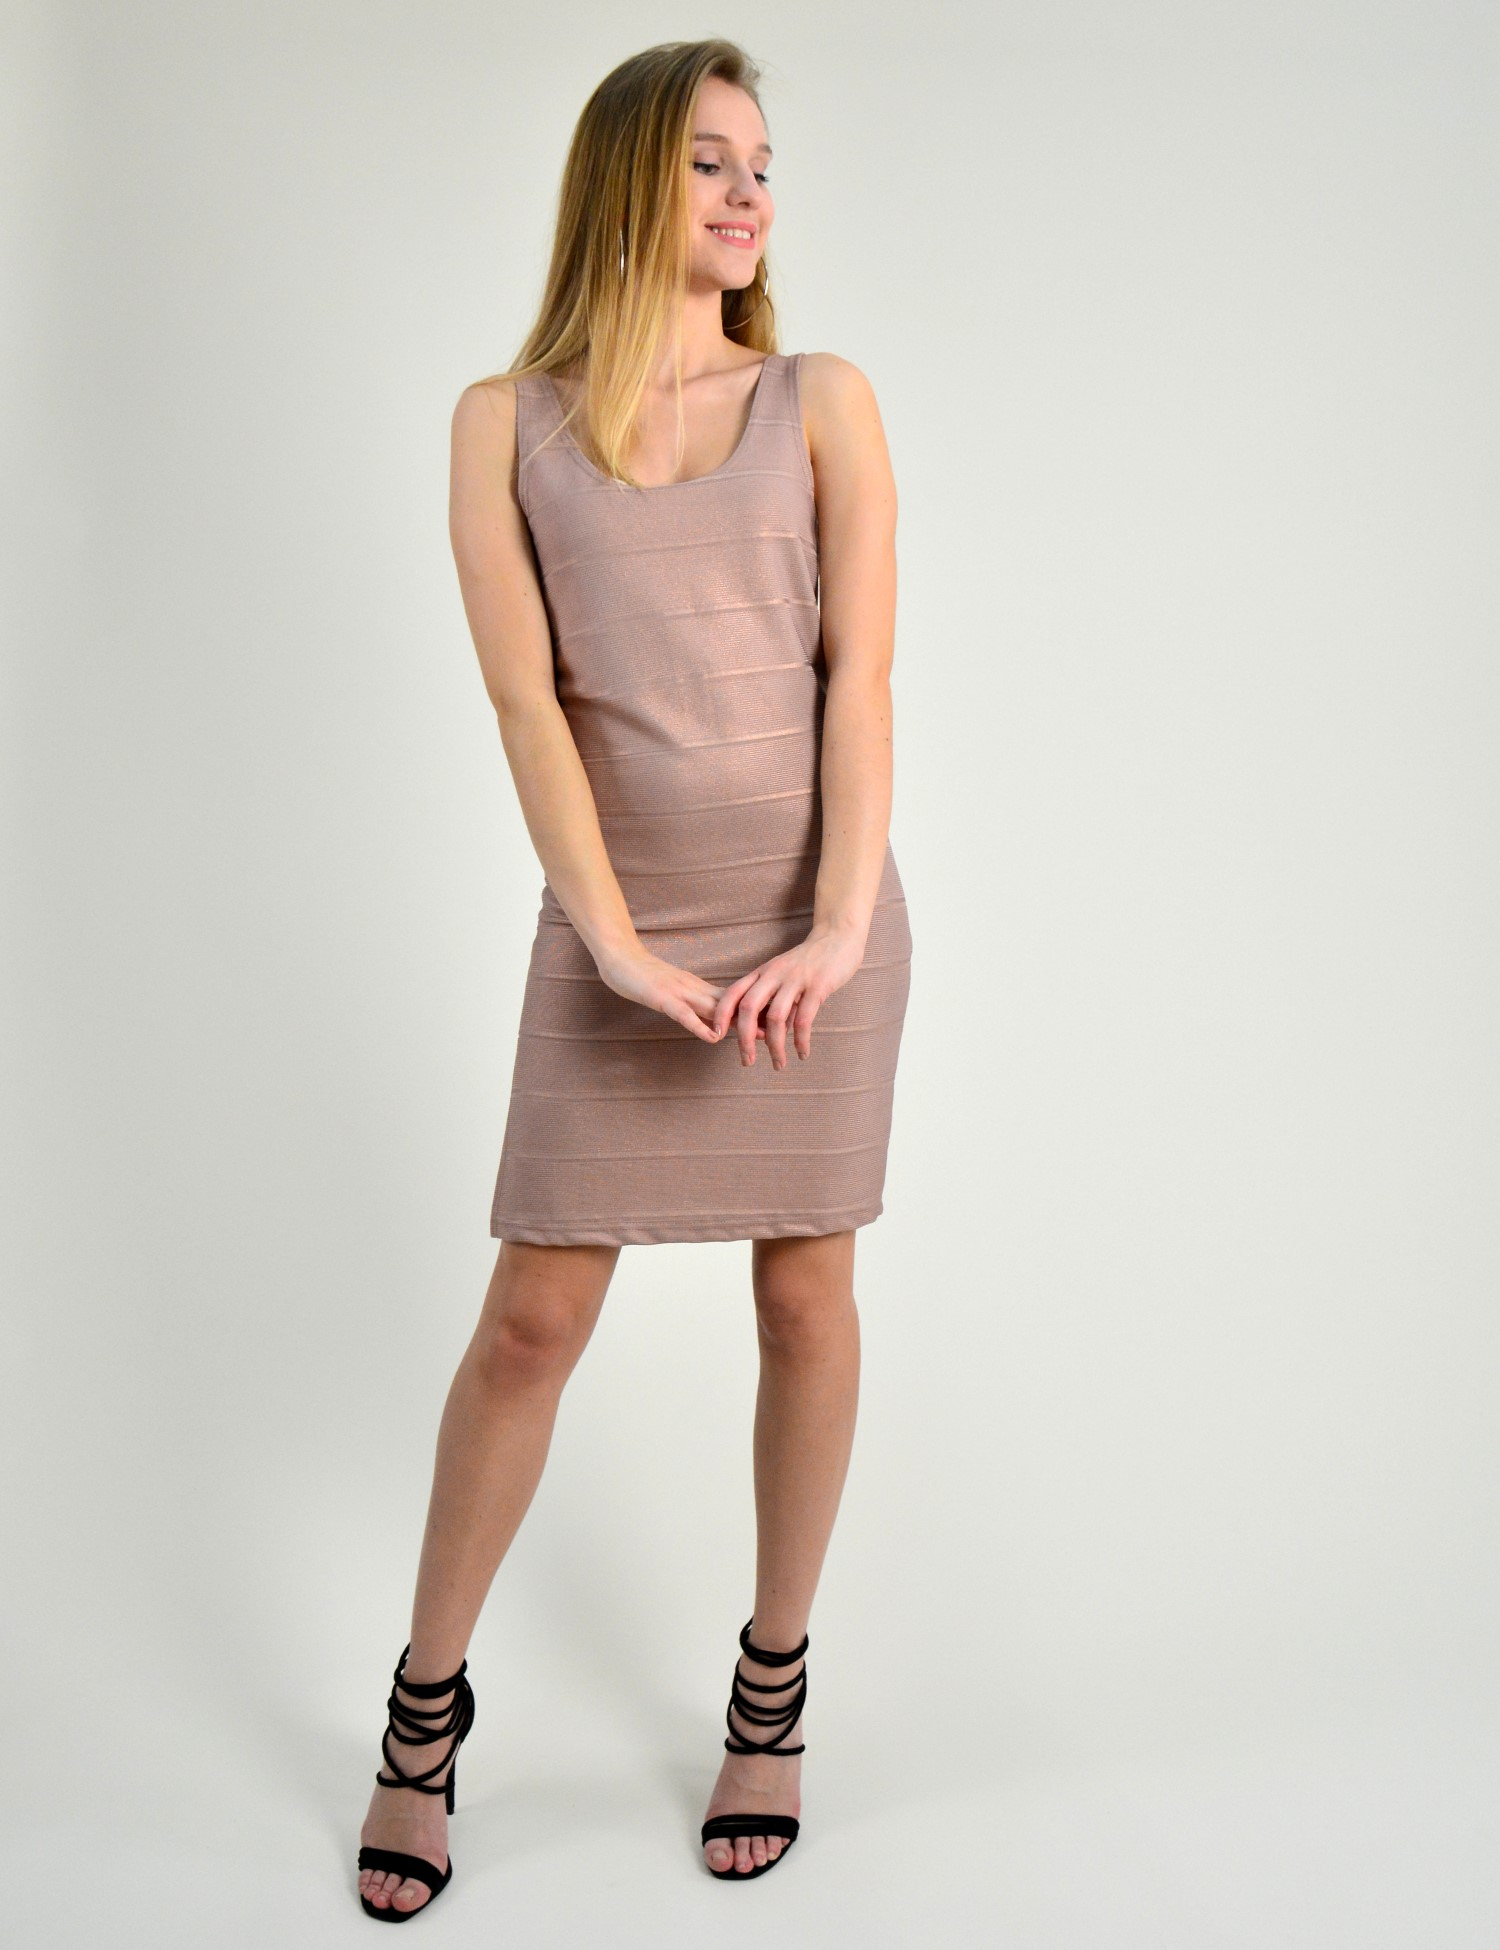 a89c1d3df611 Γυναικείο αμάνικο μίντι φόρεμα Lipsy σομόν ριπ 2170614C